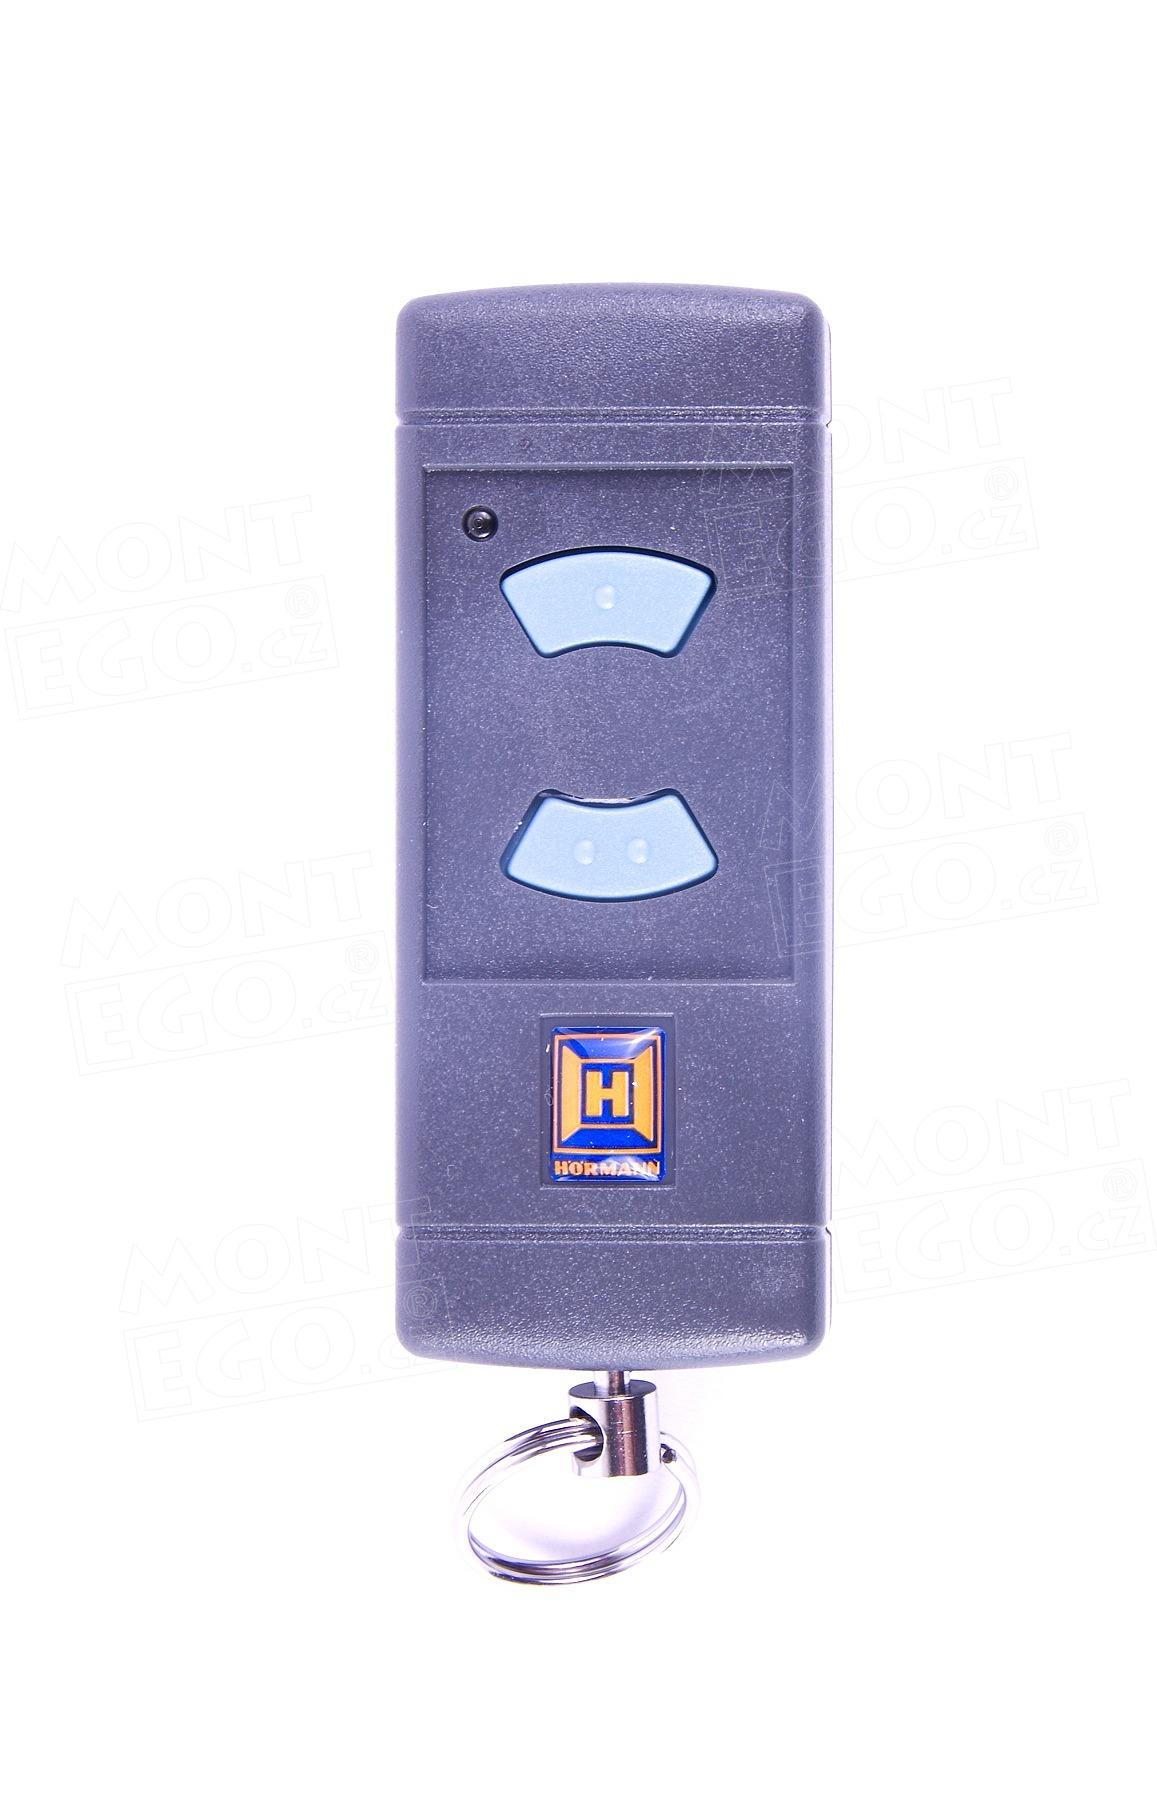 Dálkový ovladač Hörmann HSE2, 2 kanálový ovládač, 868 MHz modrá tlačítka